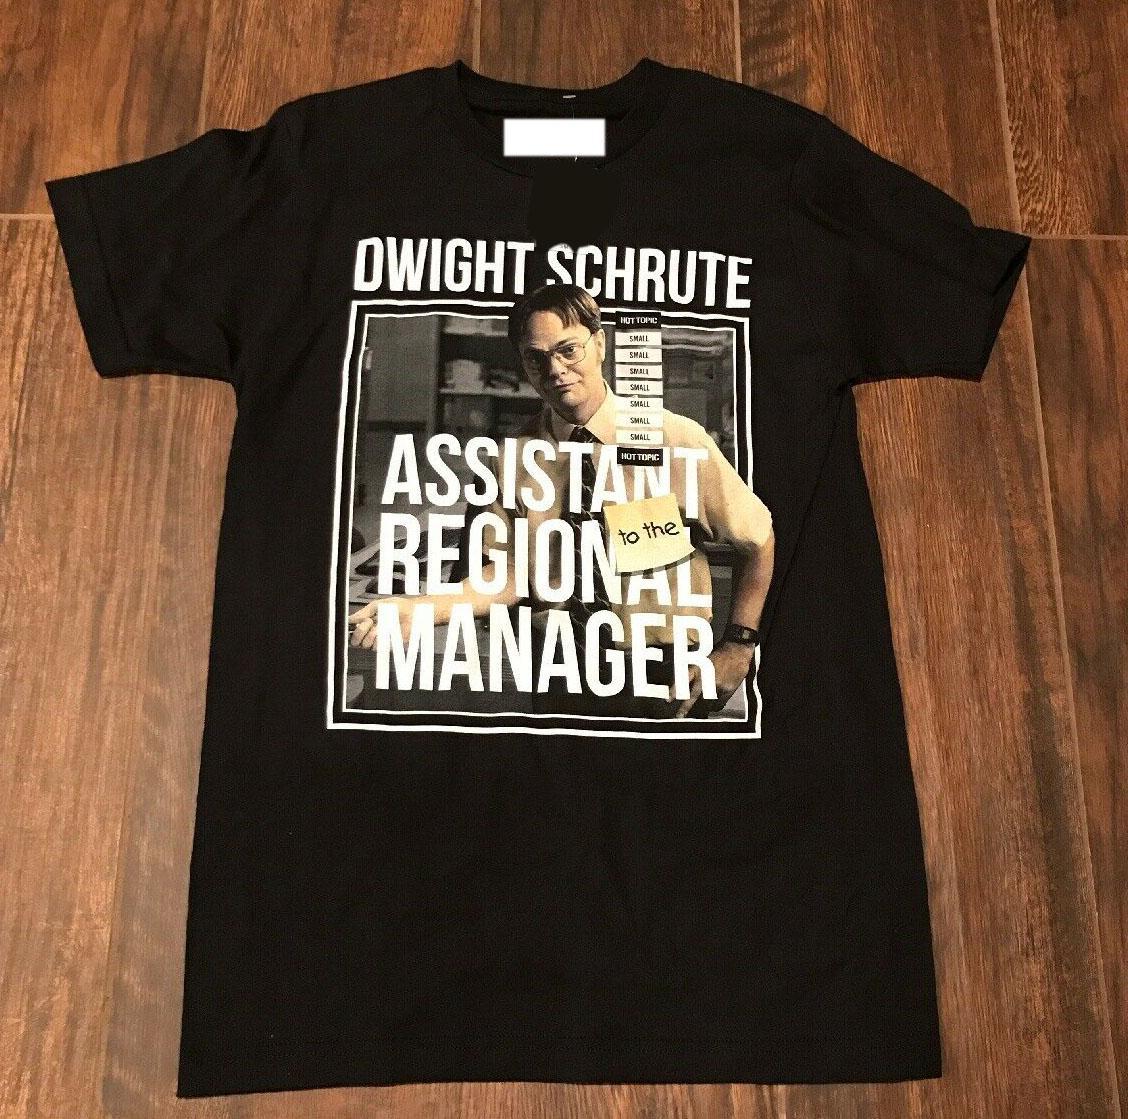 The Office, Dwight Schrute, assistente do gerente regional t-shirt S-5XL mais novo 2020 Homens T-shirt Moda Top Tee PLUS SIZE